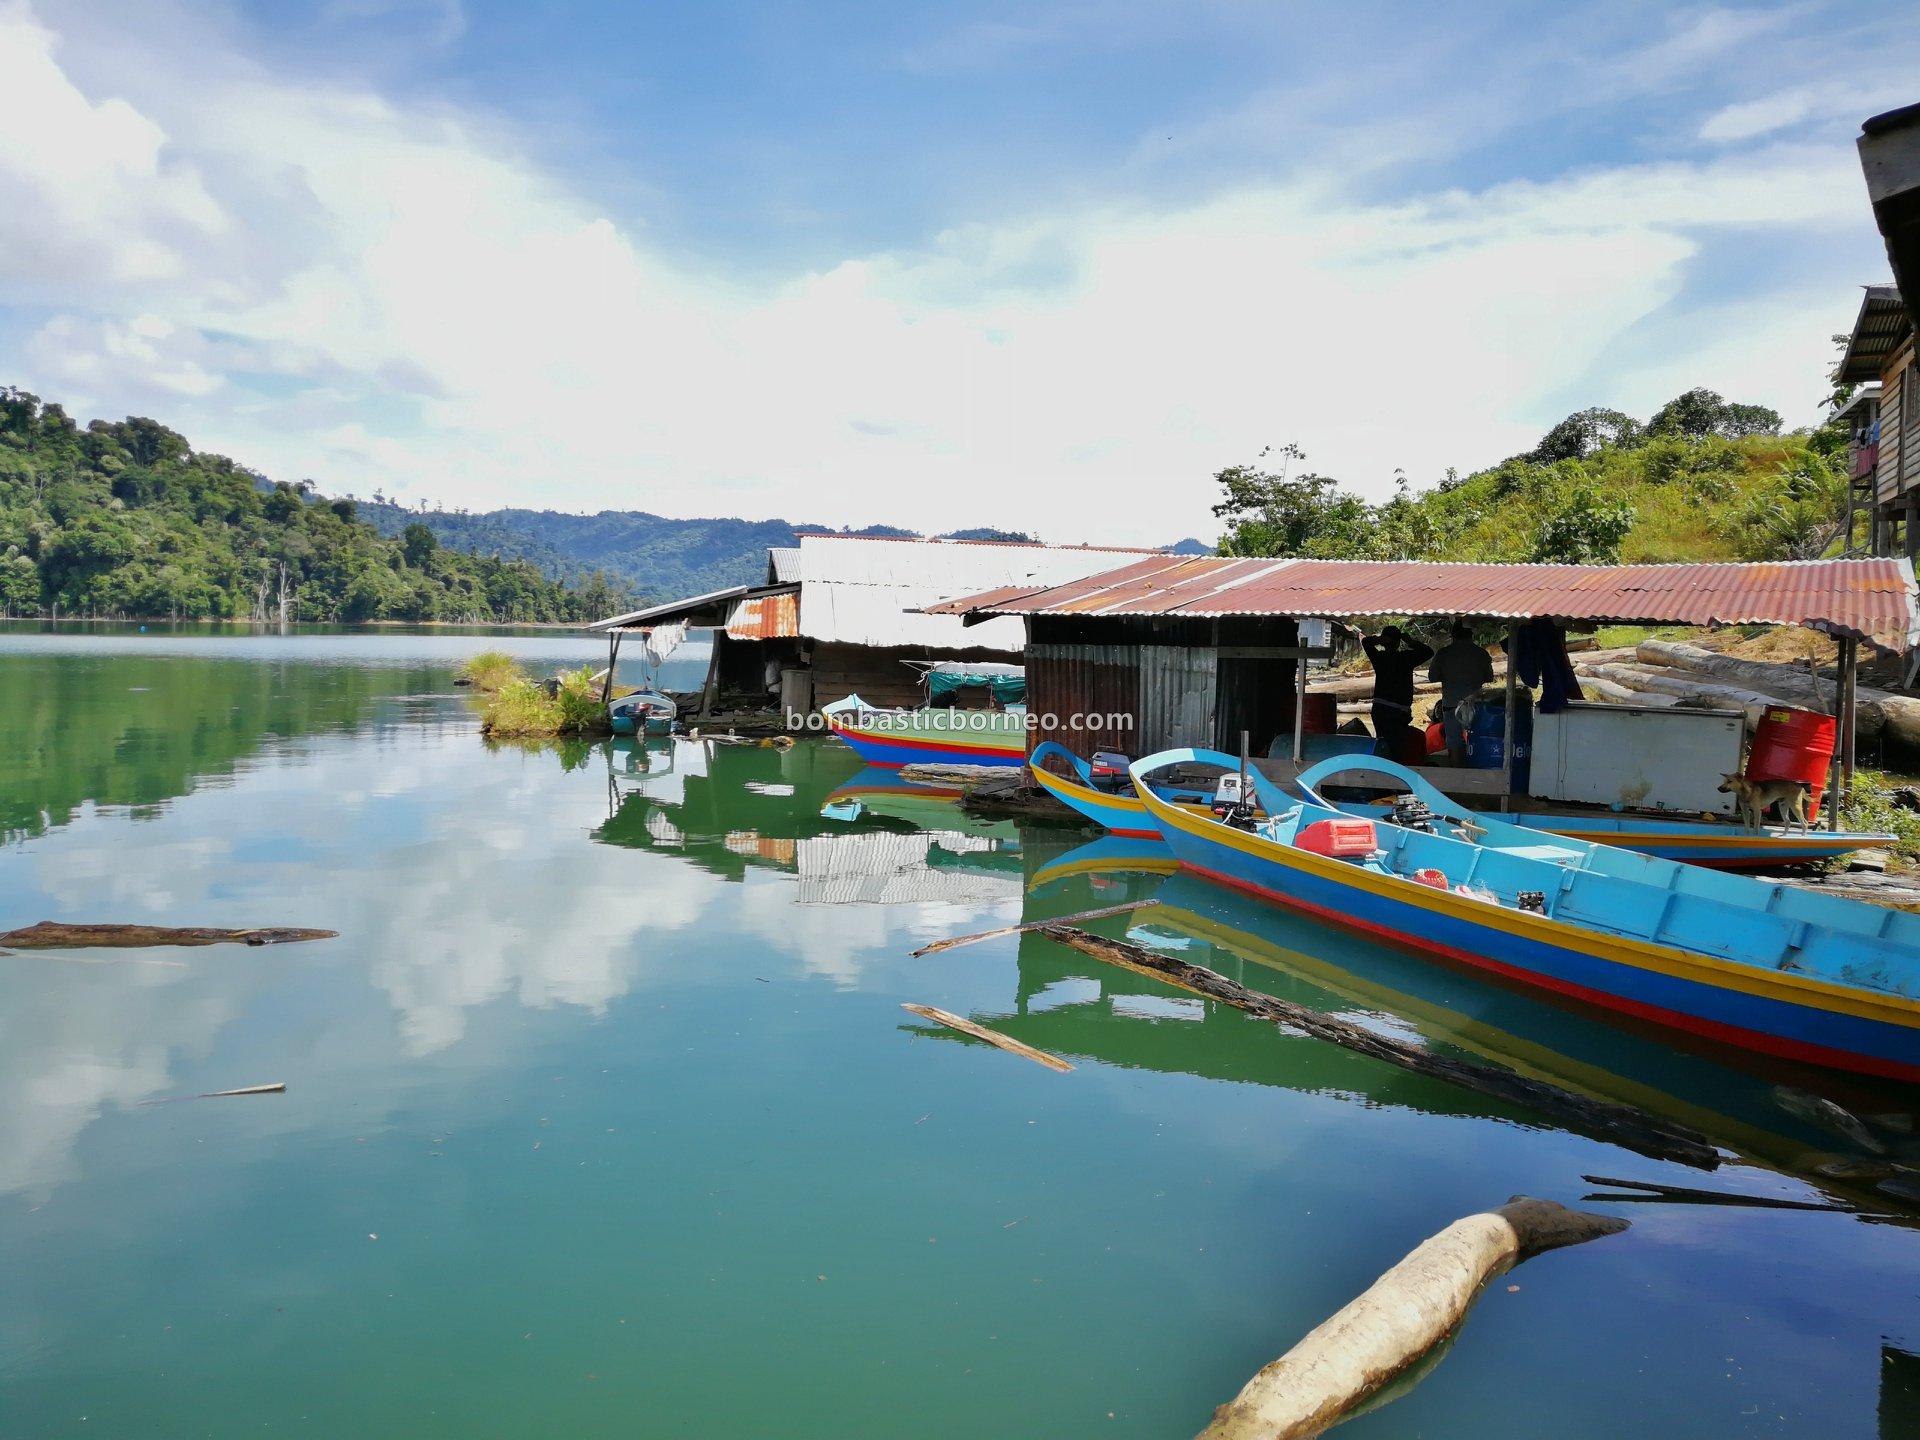 Bakun Hydroelectric Power Dam, empangan, native, Sungai Balui, fishing trip, homestay, Belaga, Kapit, Sarawak, Tourism, tourist attraction, travel guide, Cross Border, Borneo, 婆罗洲钓鱼之旅,